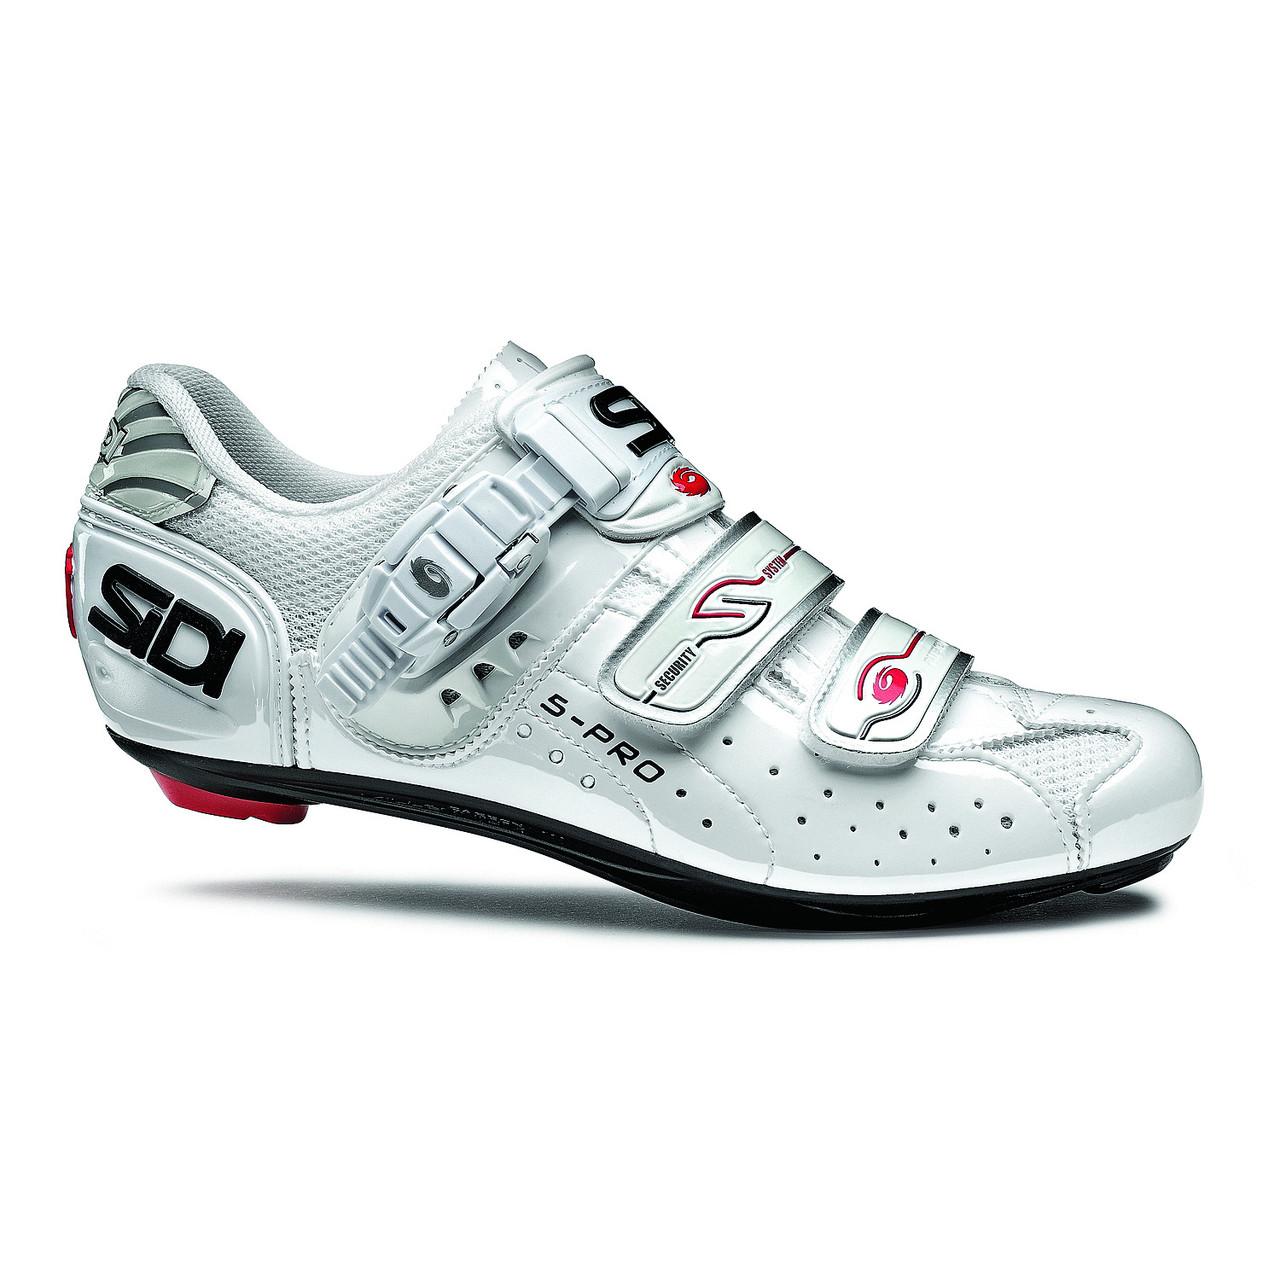 cf7f9801d20de Women's SIDI® Genius 5 Road Shoes | Spinning®